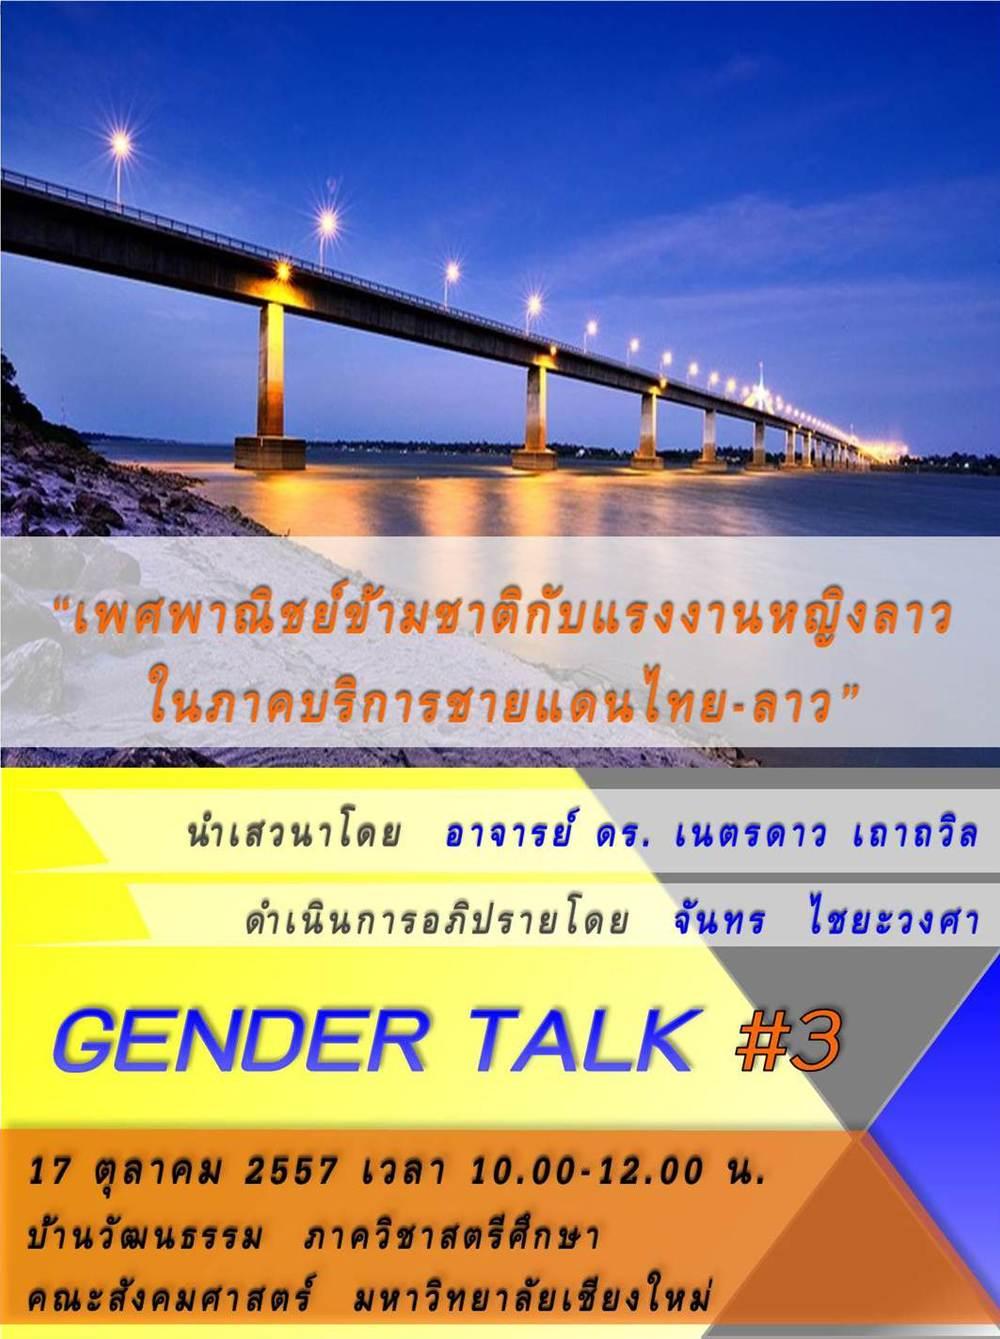 GENDER TALK #3